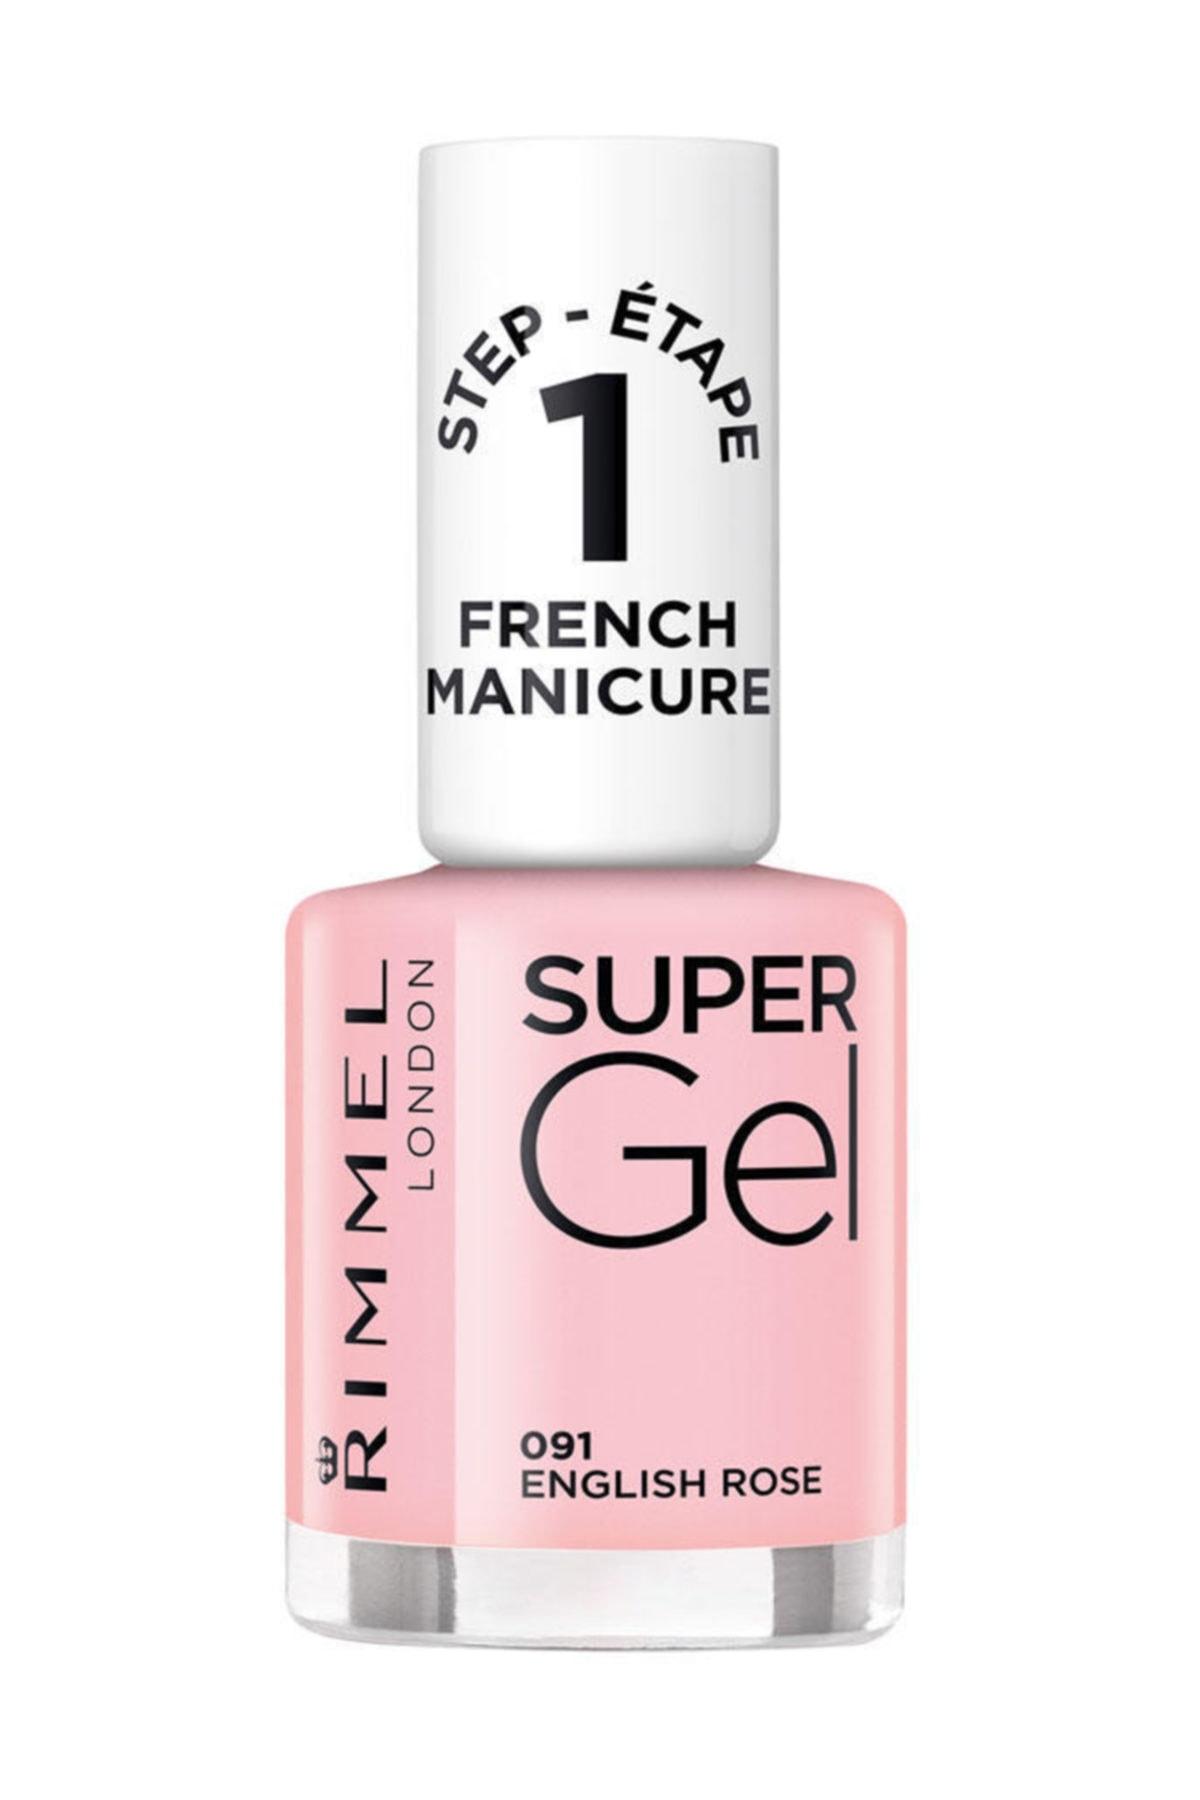 RIMMEL LONDON Oje - Super Gel French Manicure 091 English Rose 12 ml 30121553 1